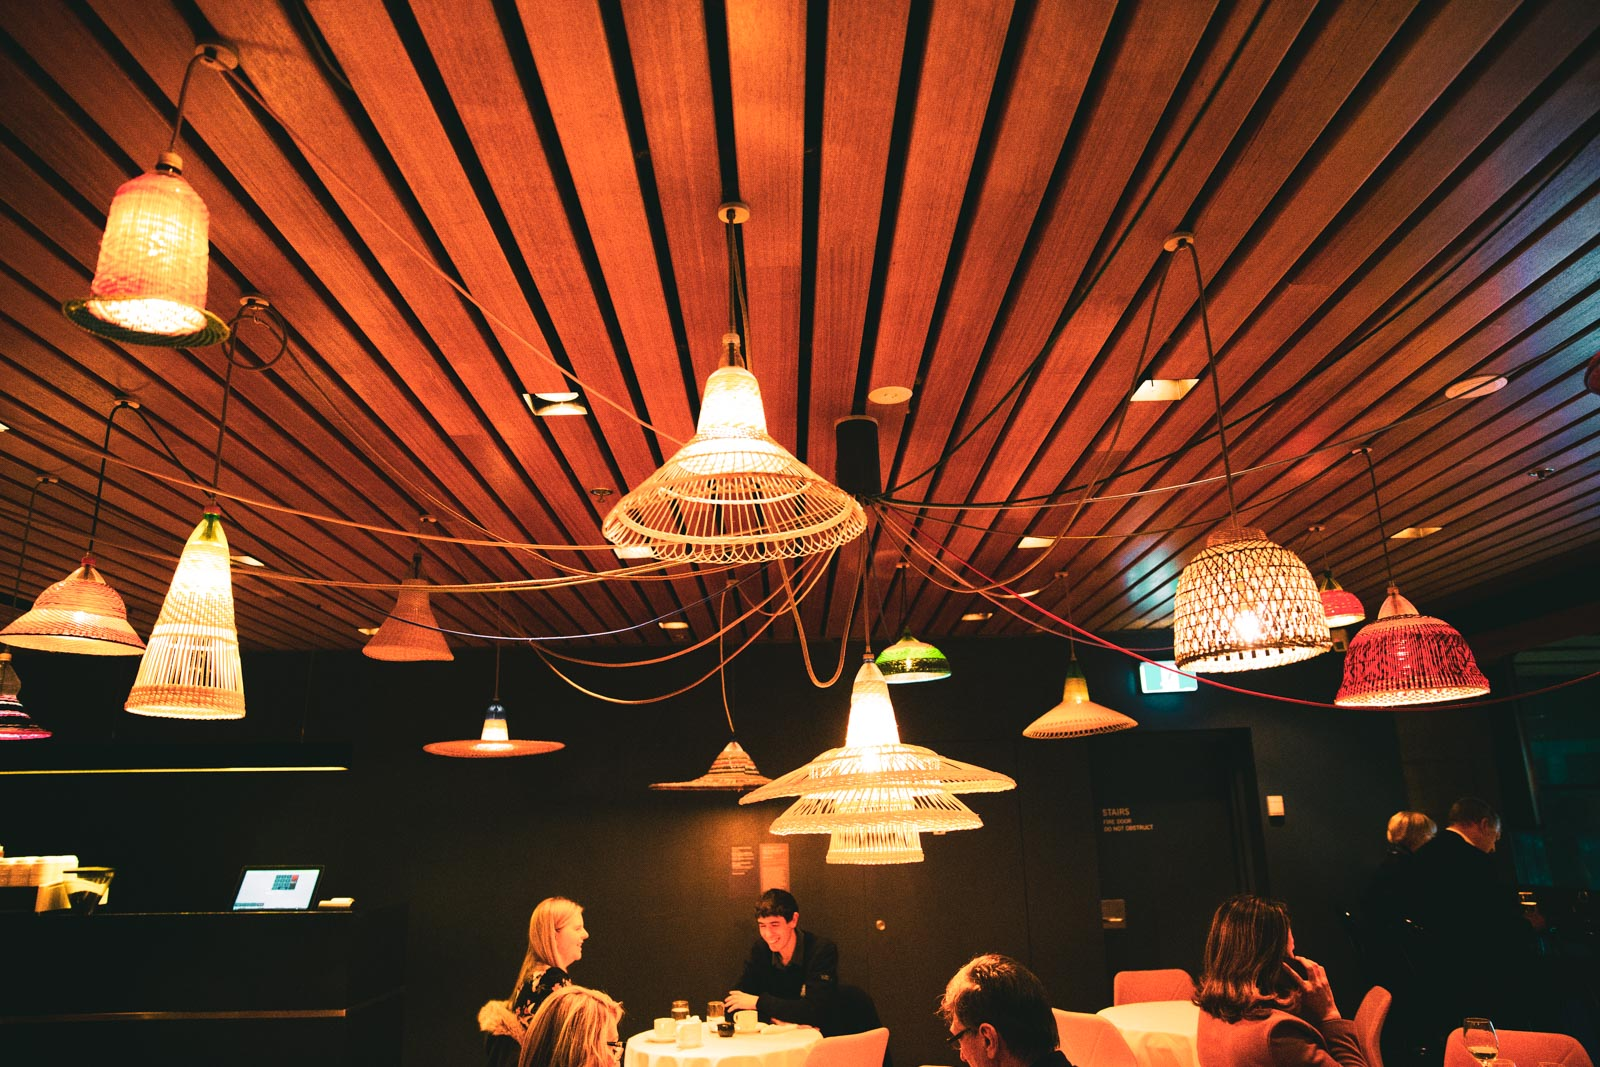 alexa-wright-cafes-1.jpg